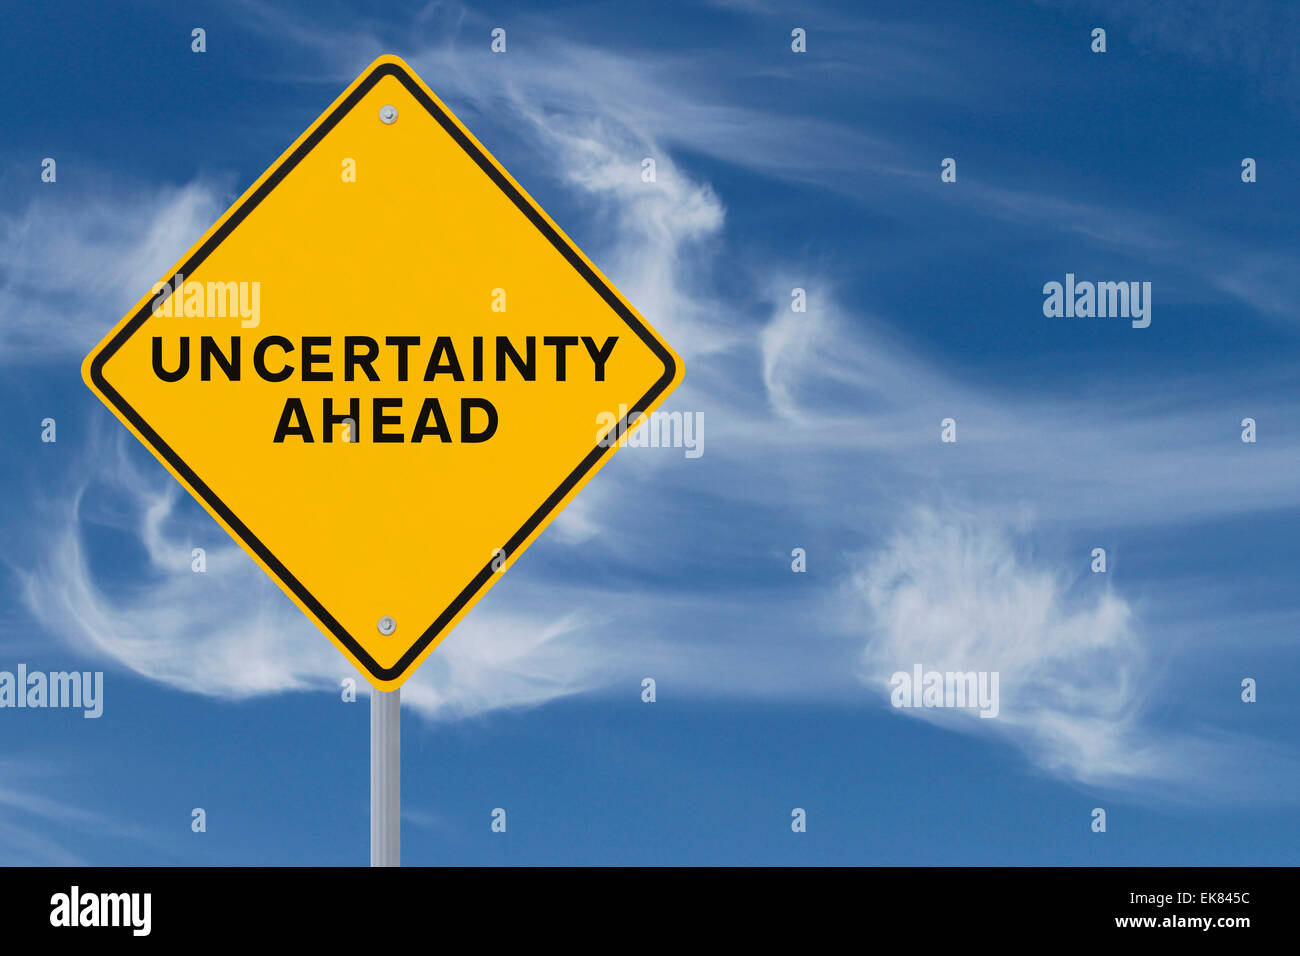 Uncertainty Ahead - Stock Image